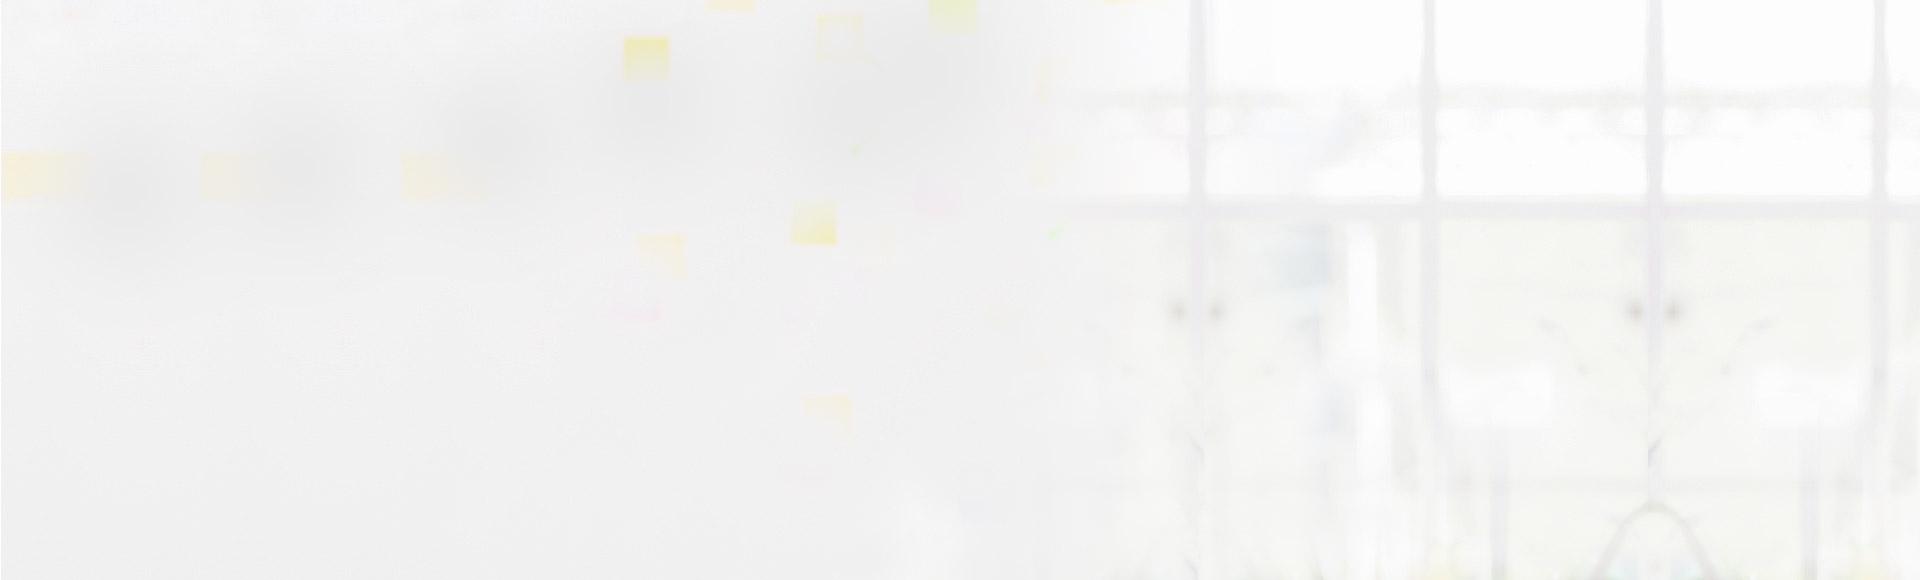 Web Design Alderley Edge, Web Design Altrincham, Web Design Holmes Chapel, Web Design Knutsford, Web Design Manchester, Web Design Prestbury, Web Design Wilmslow, web design, website design, Alderley Edge, Altrincham, Holmes Chapel, Knutsford, Manchester, Prestbury, Wilmslow, Cheshire, Manchester